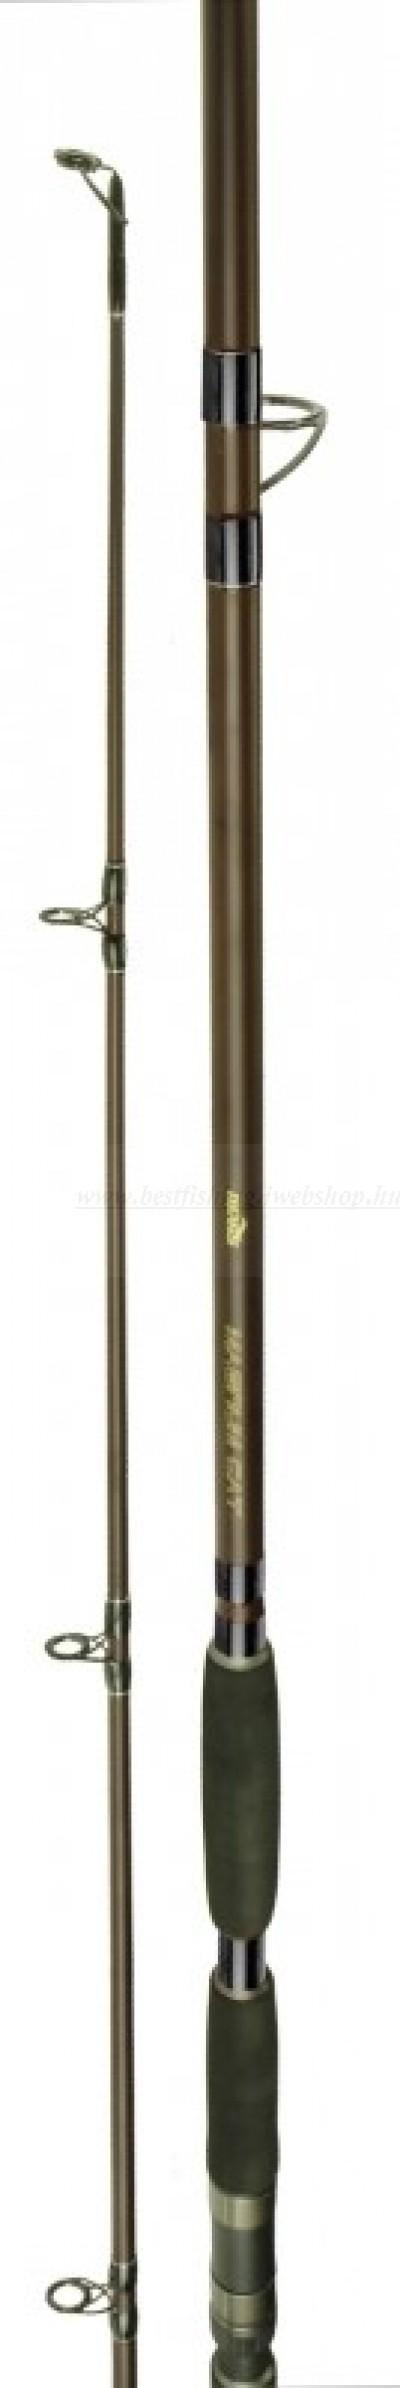 Lanseta Nevis Magnum 3m 300-500gr (1970-300)